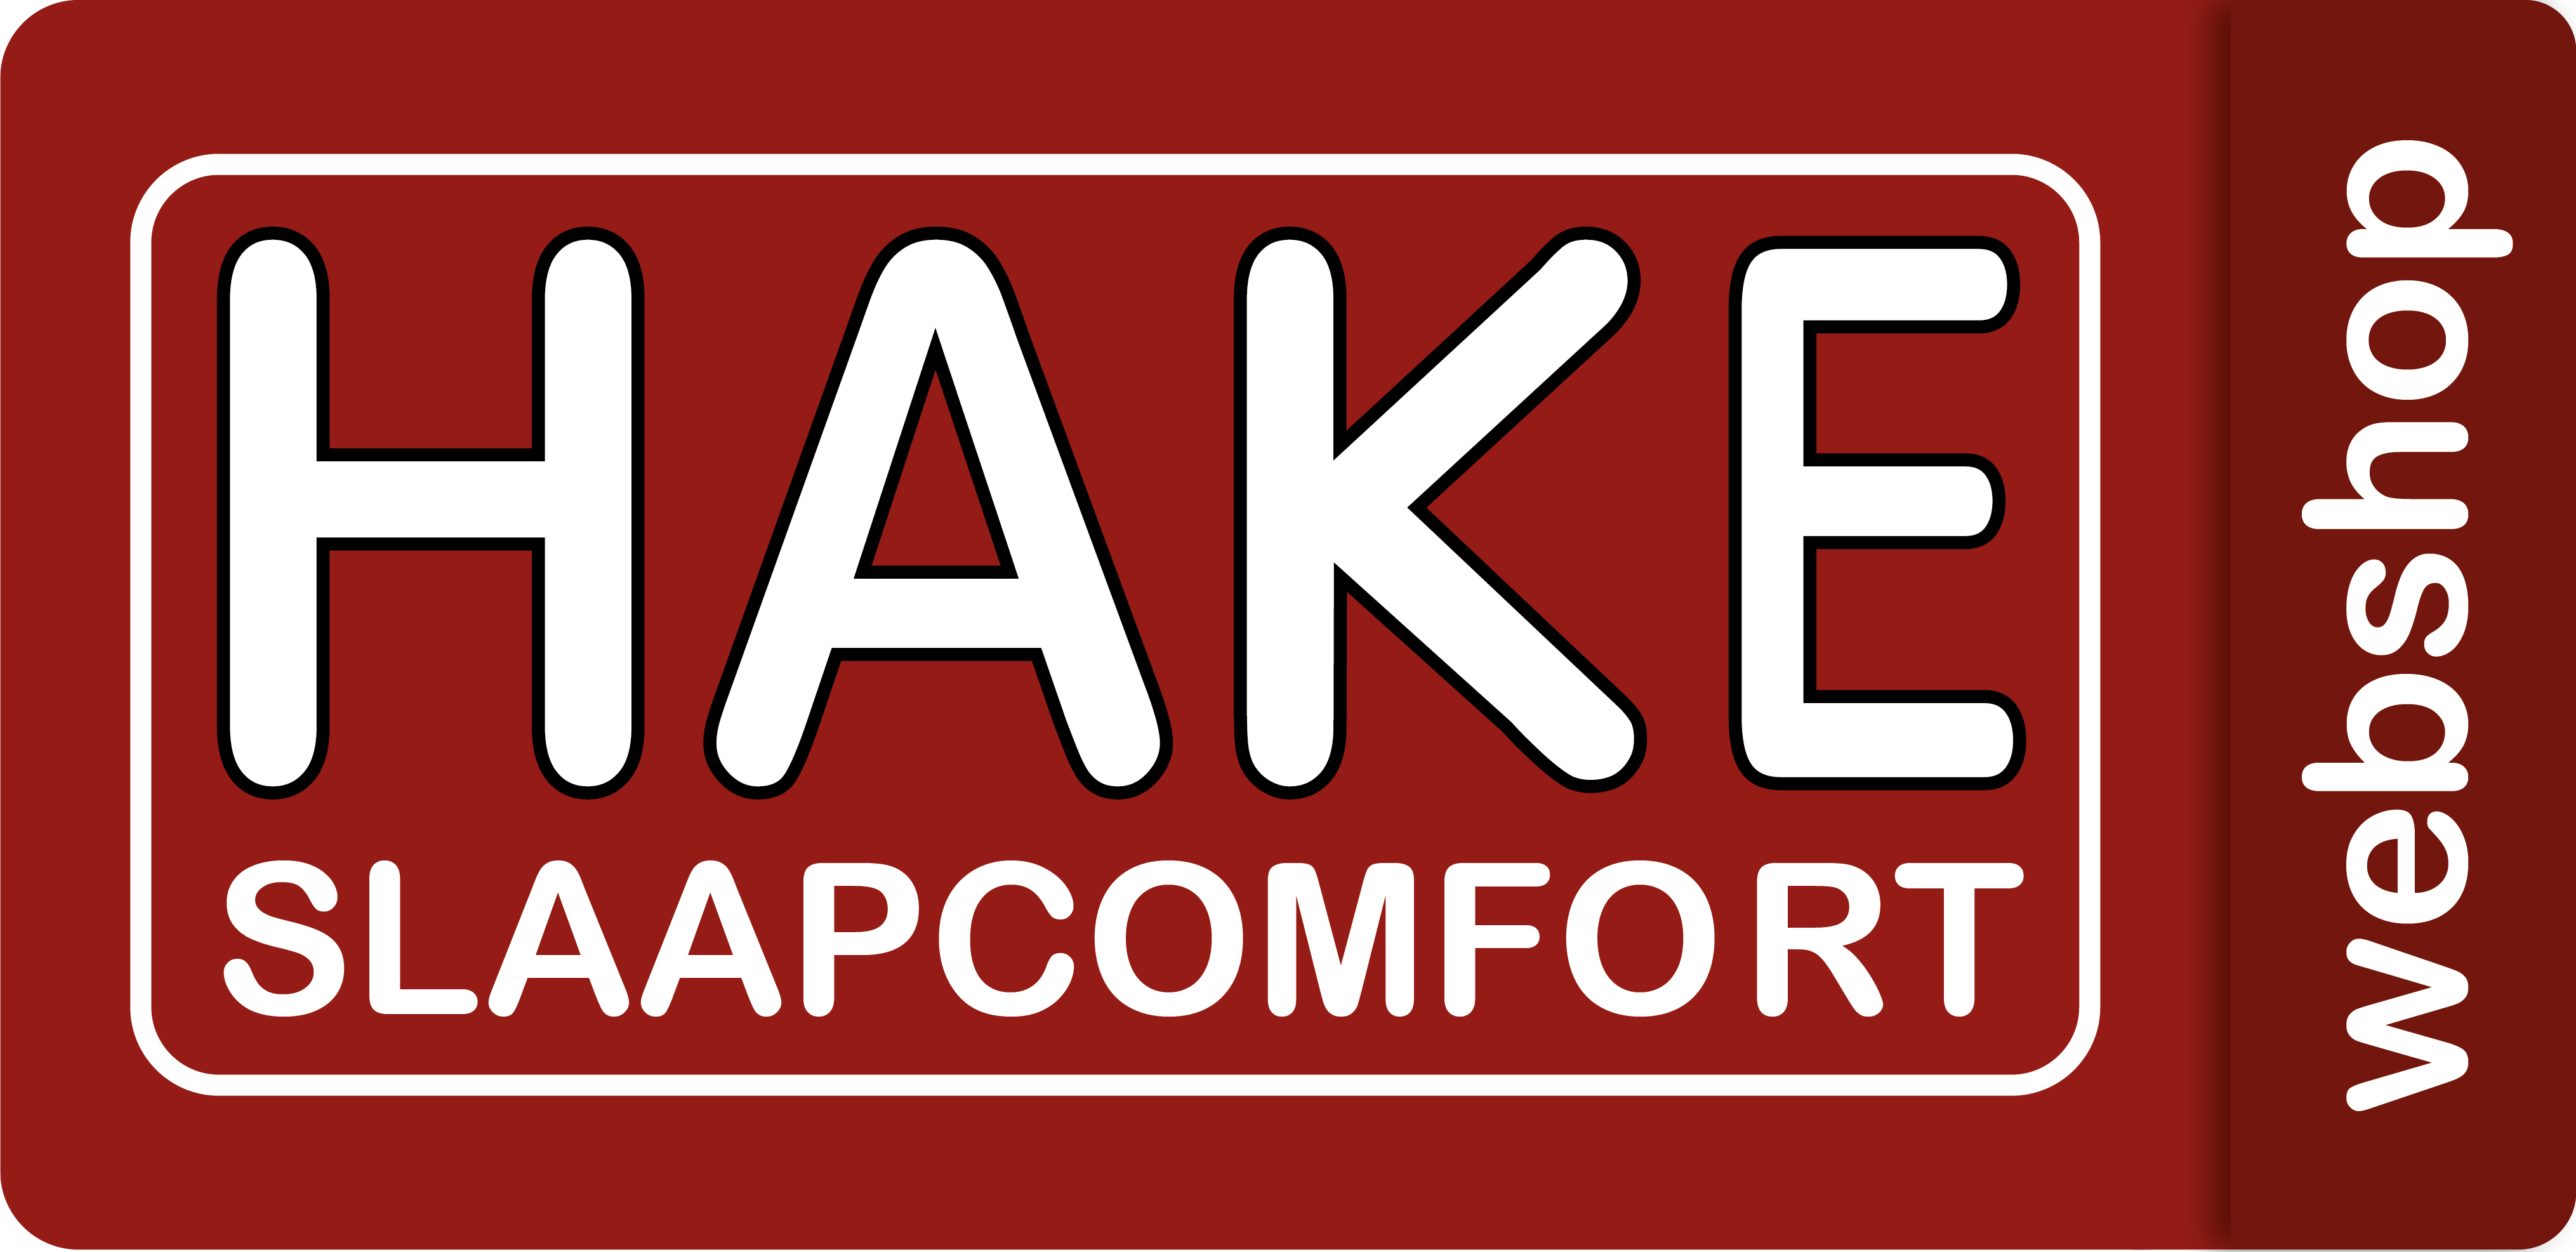 Hake Slaapcomfort Shop